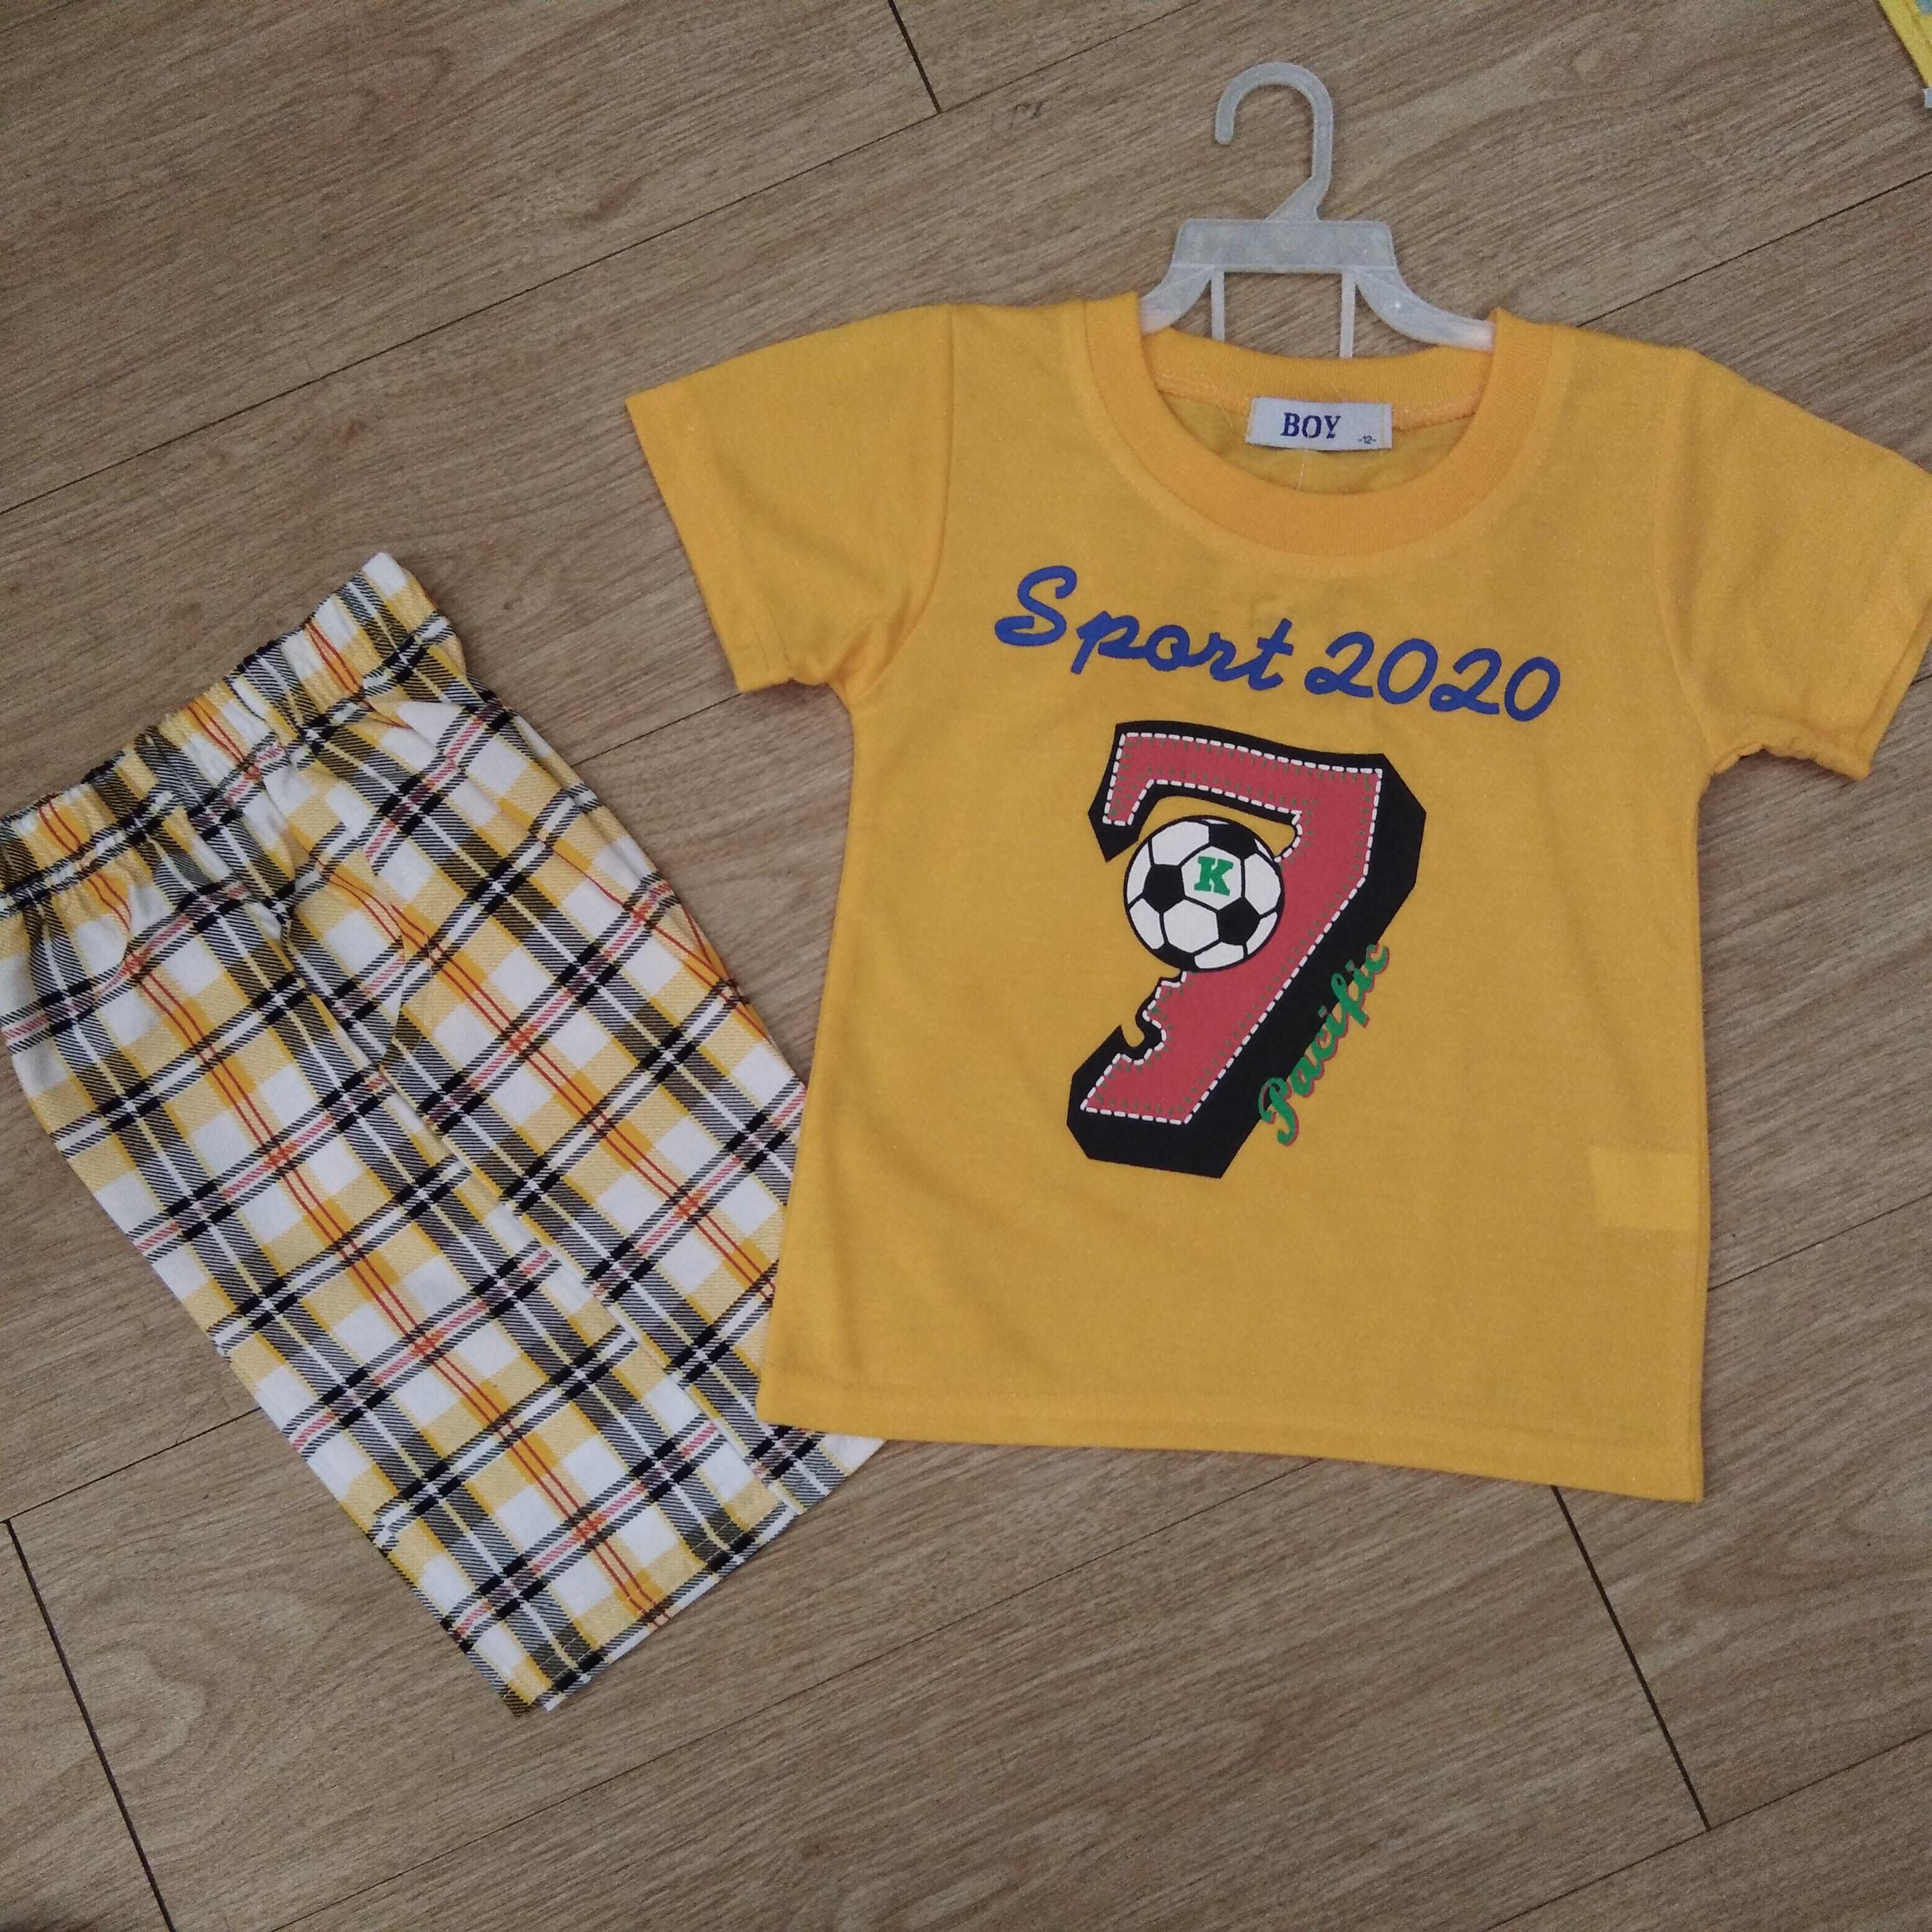 9ecd4f53b3794 مصادر شركات تصنيع ملابس الاطفال تركيا وملابس الاطفال تركيا في Alibaba.com